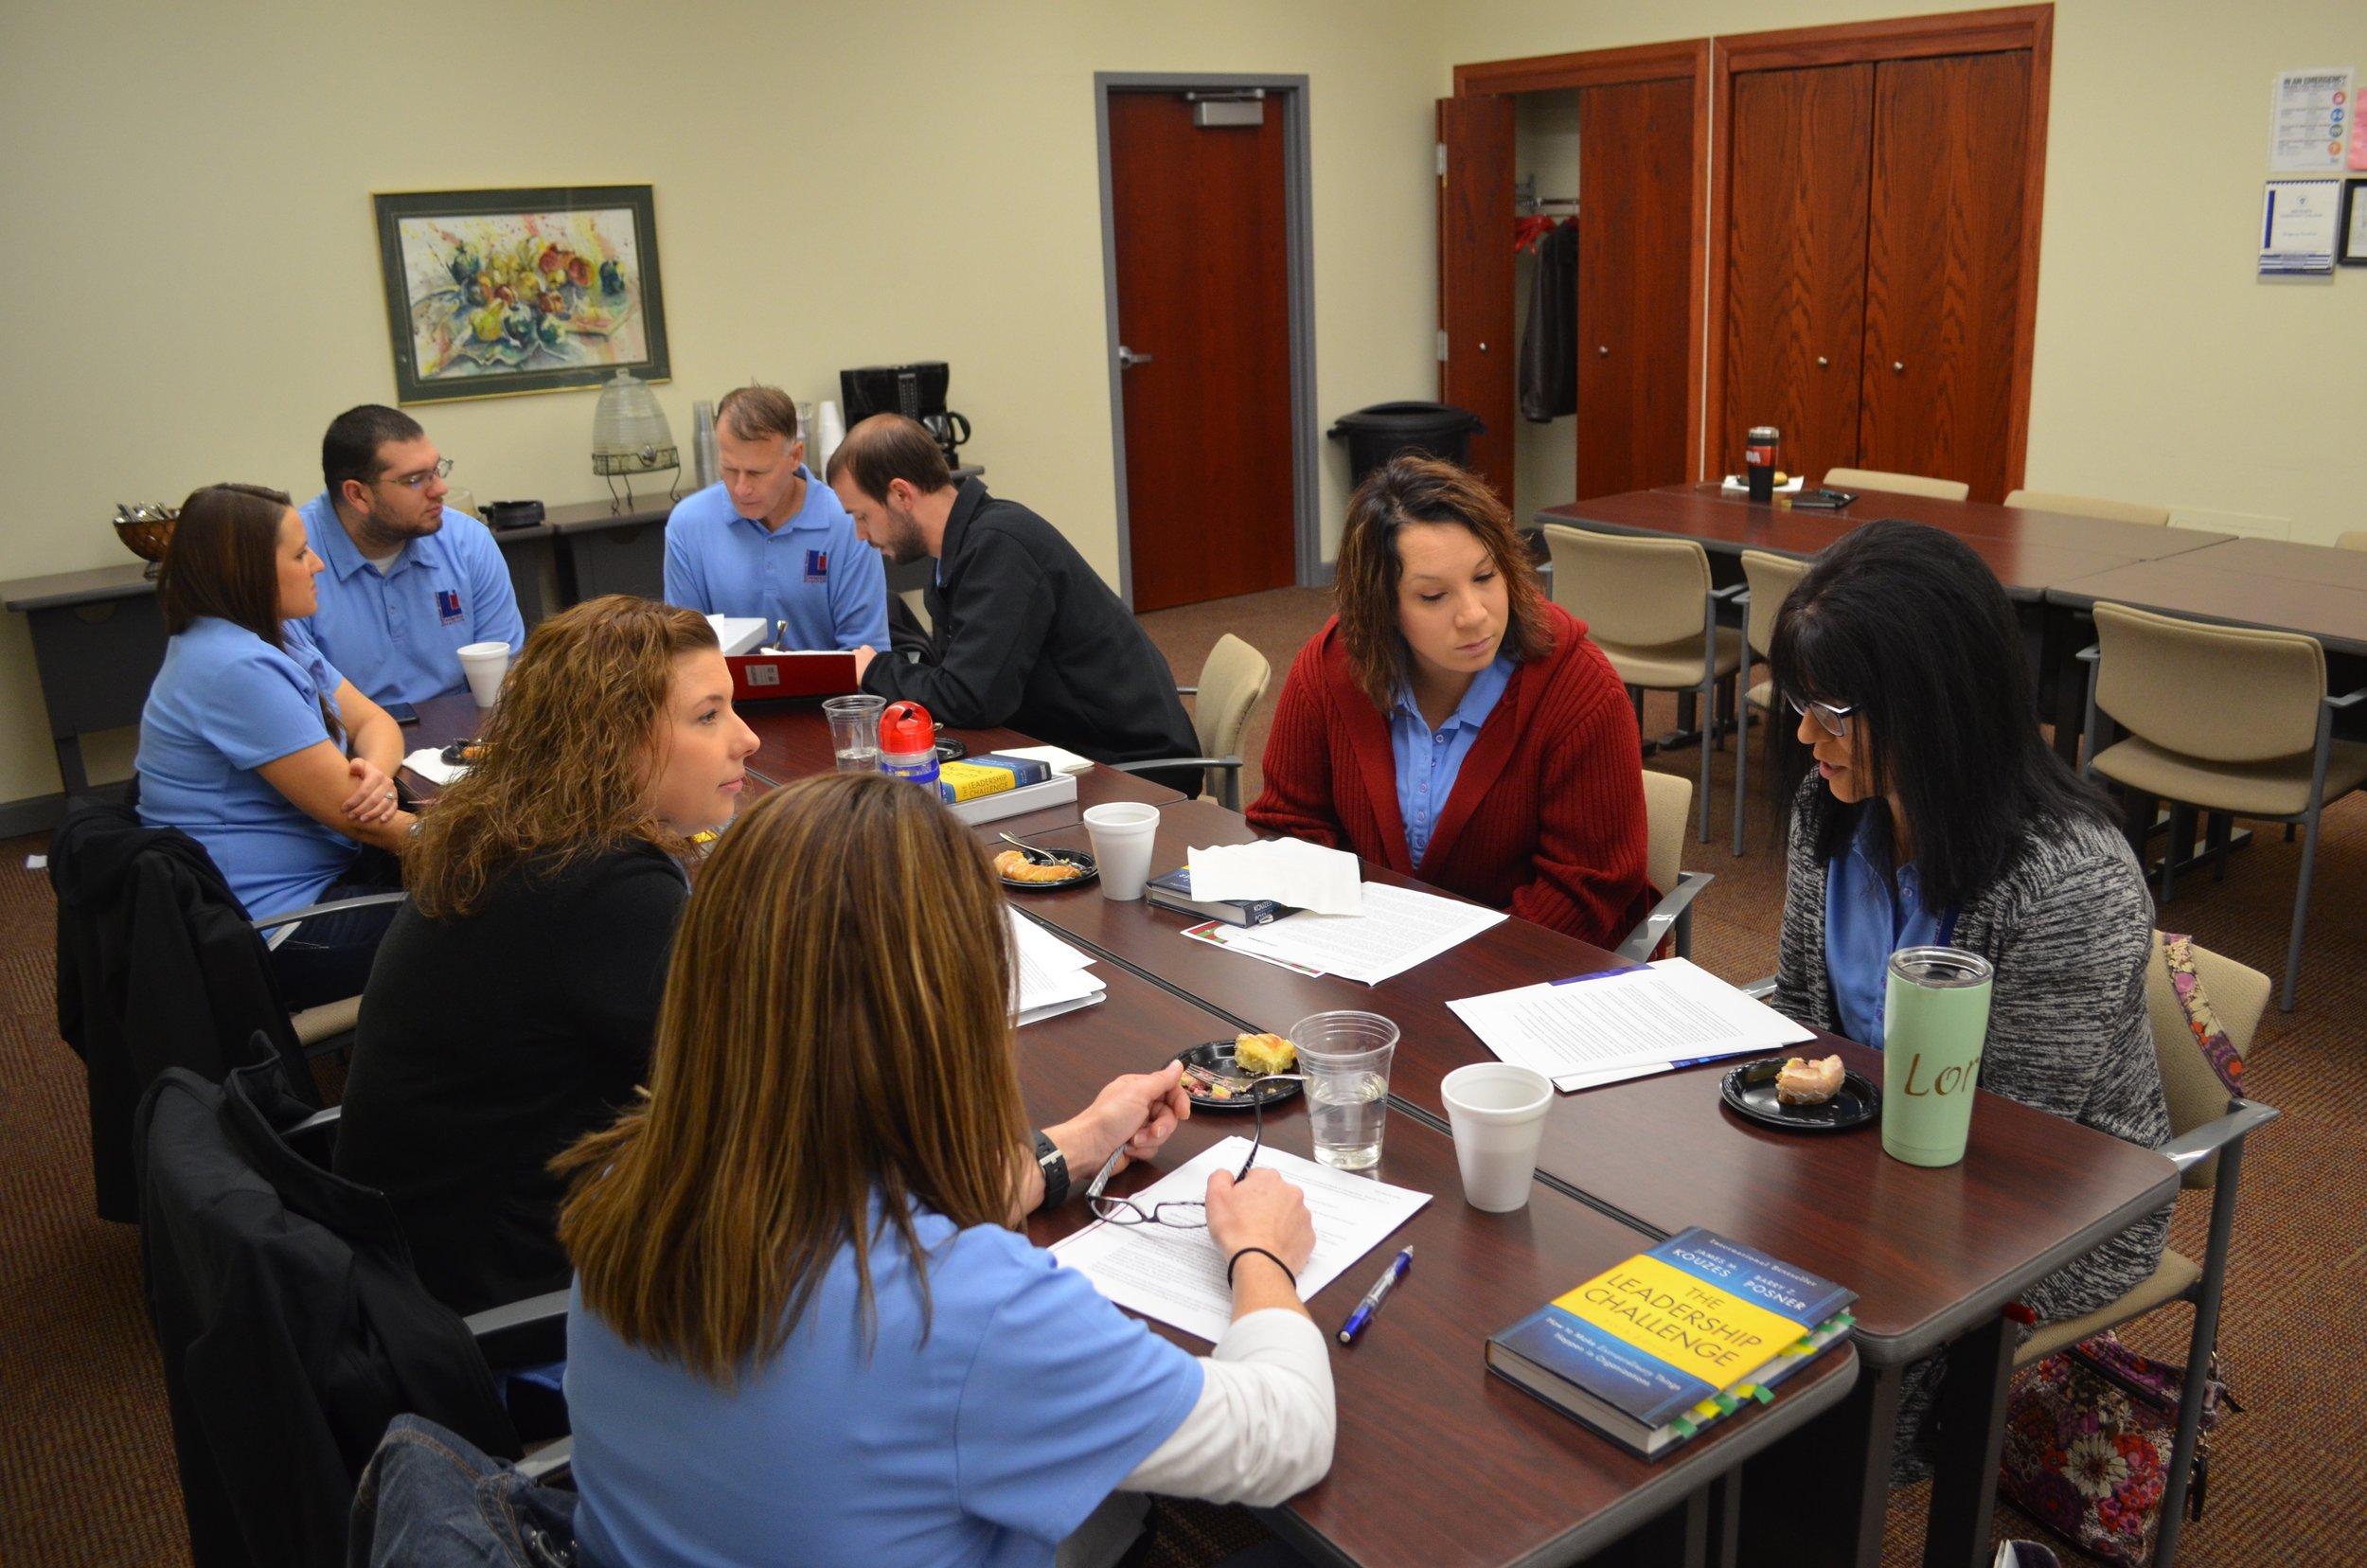 Leadership Training Program designed to help your organization.